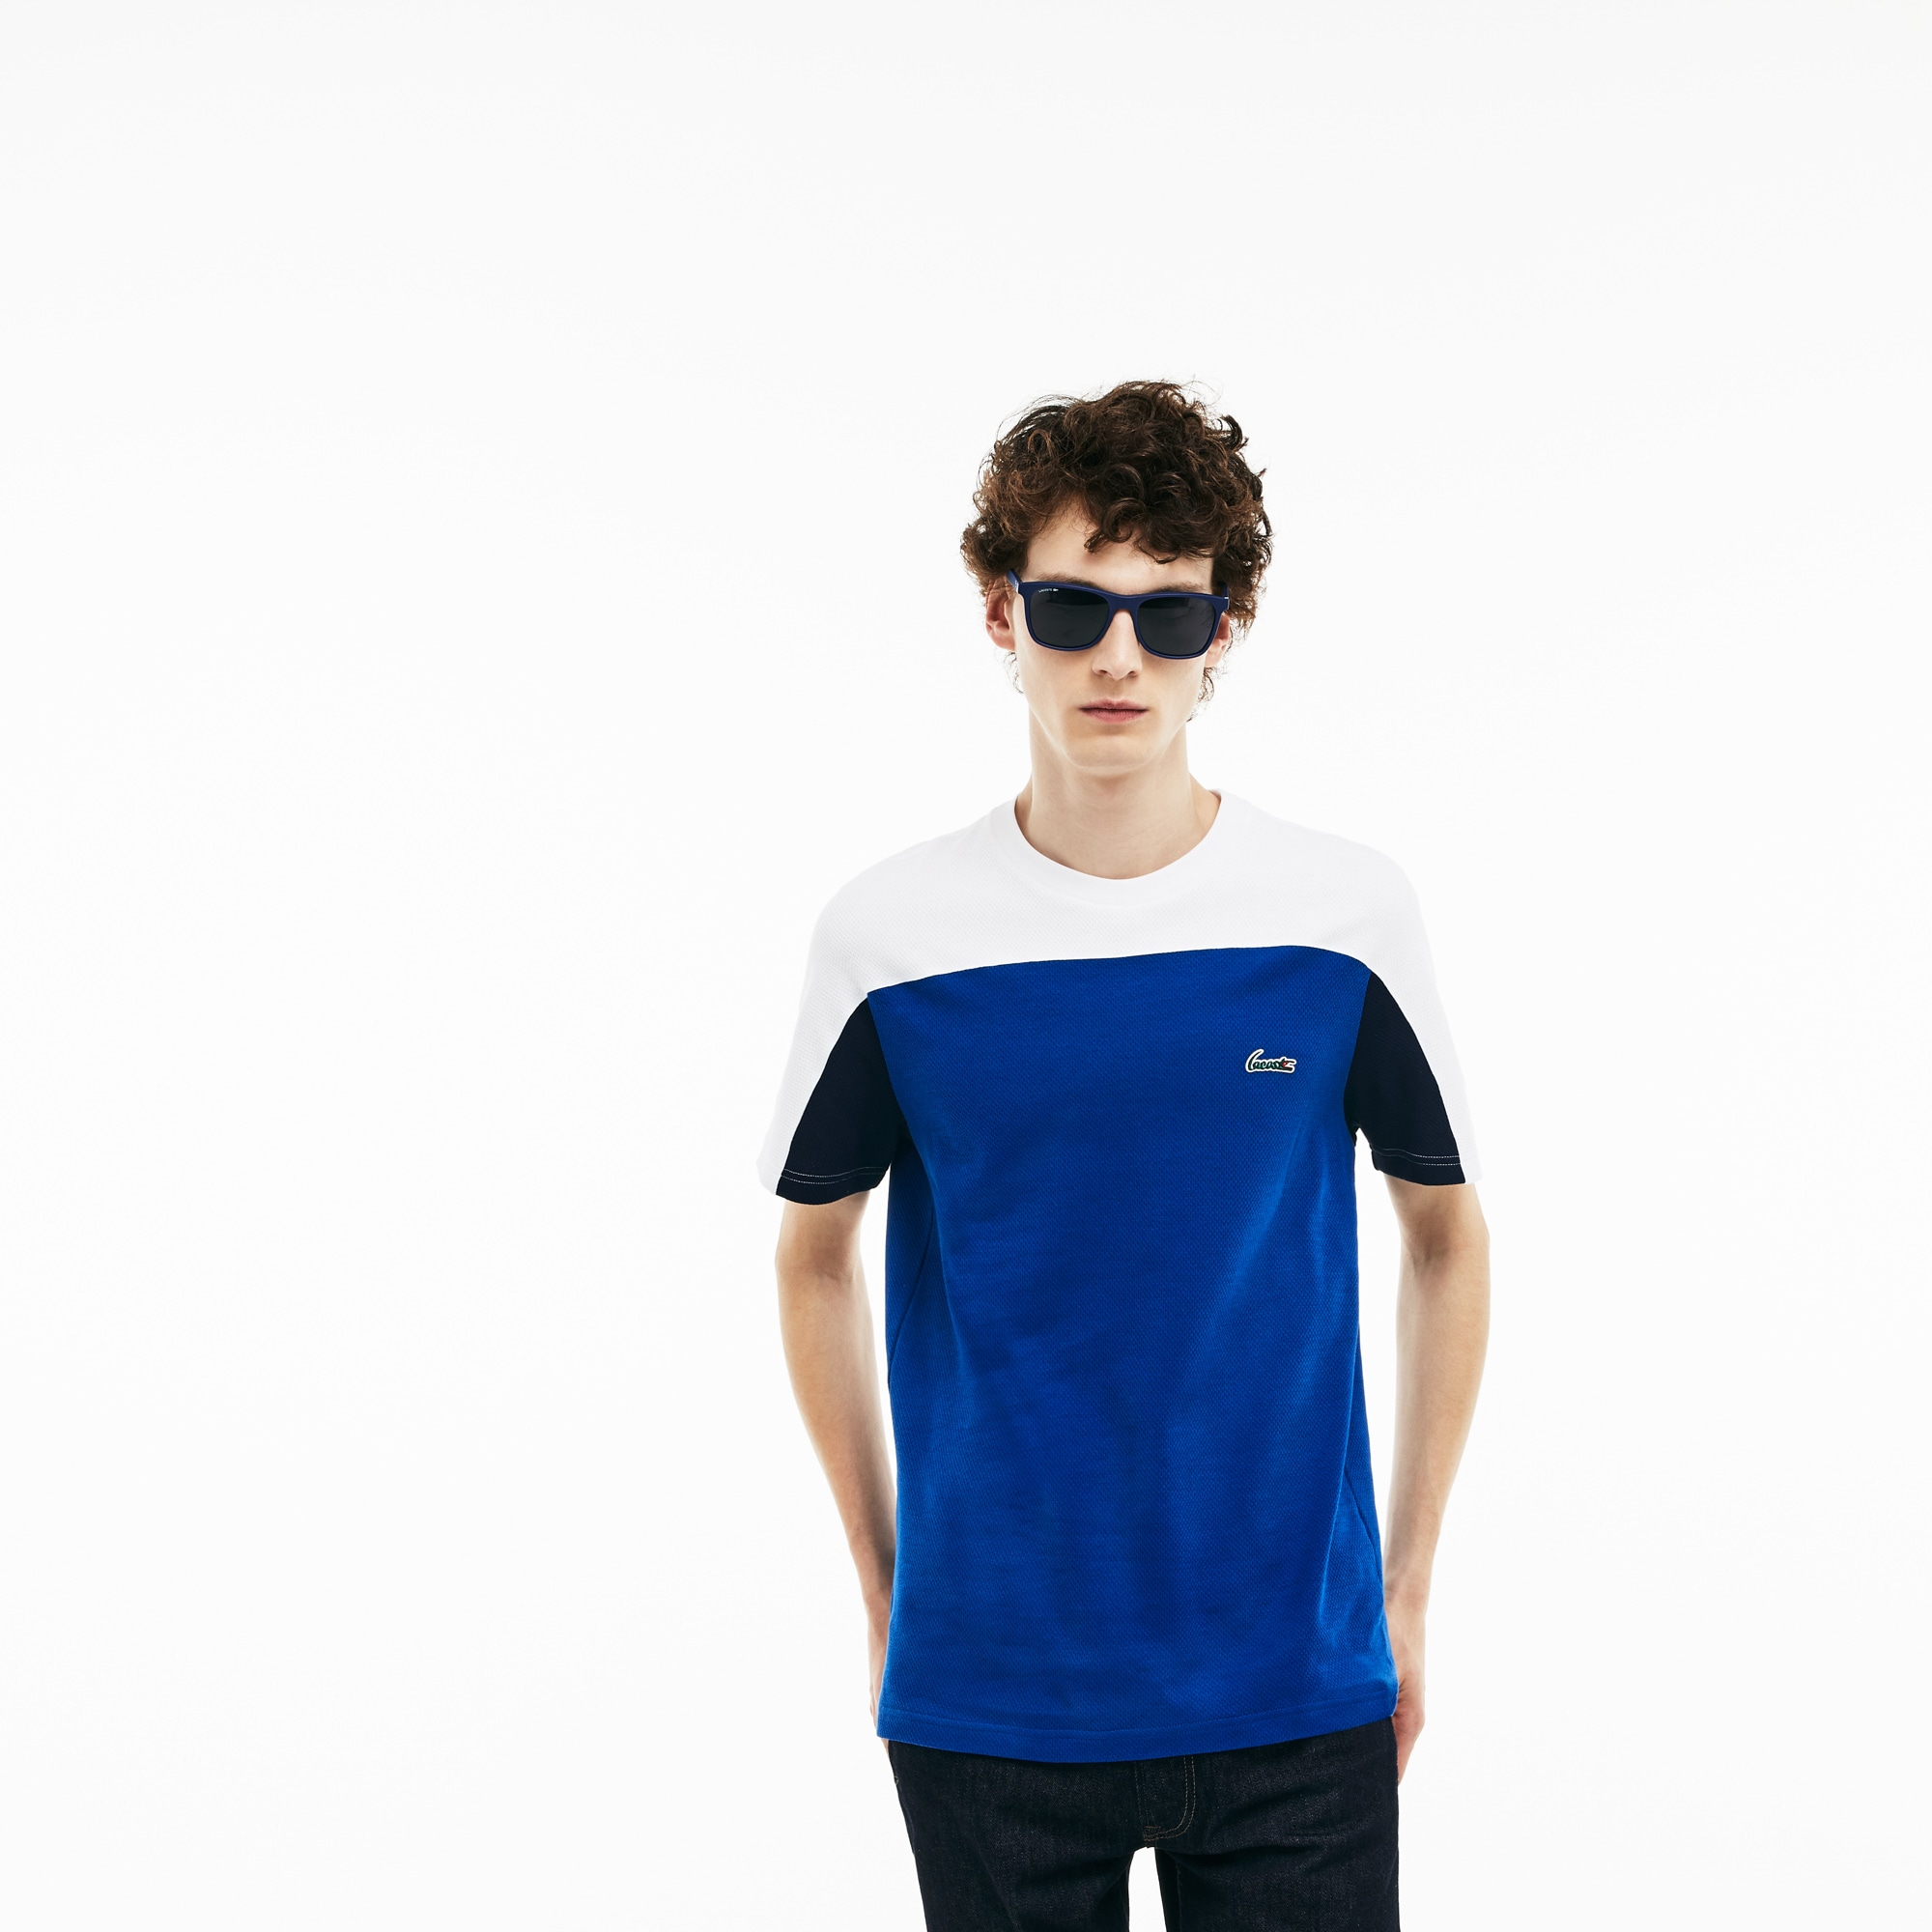 Men's Crew Neck Colorblock Mini Cotton Jacquard T-shirt